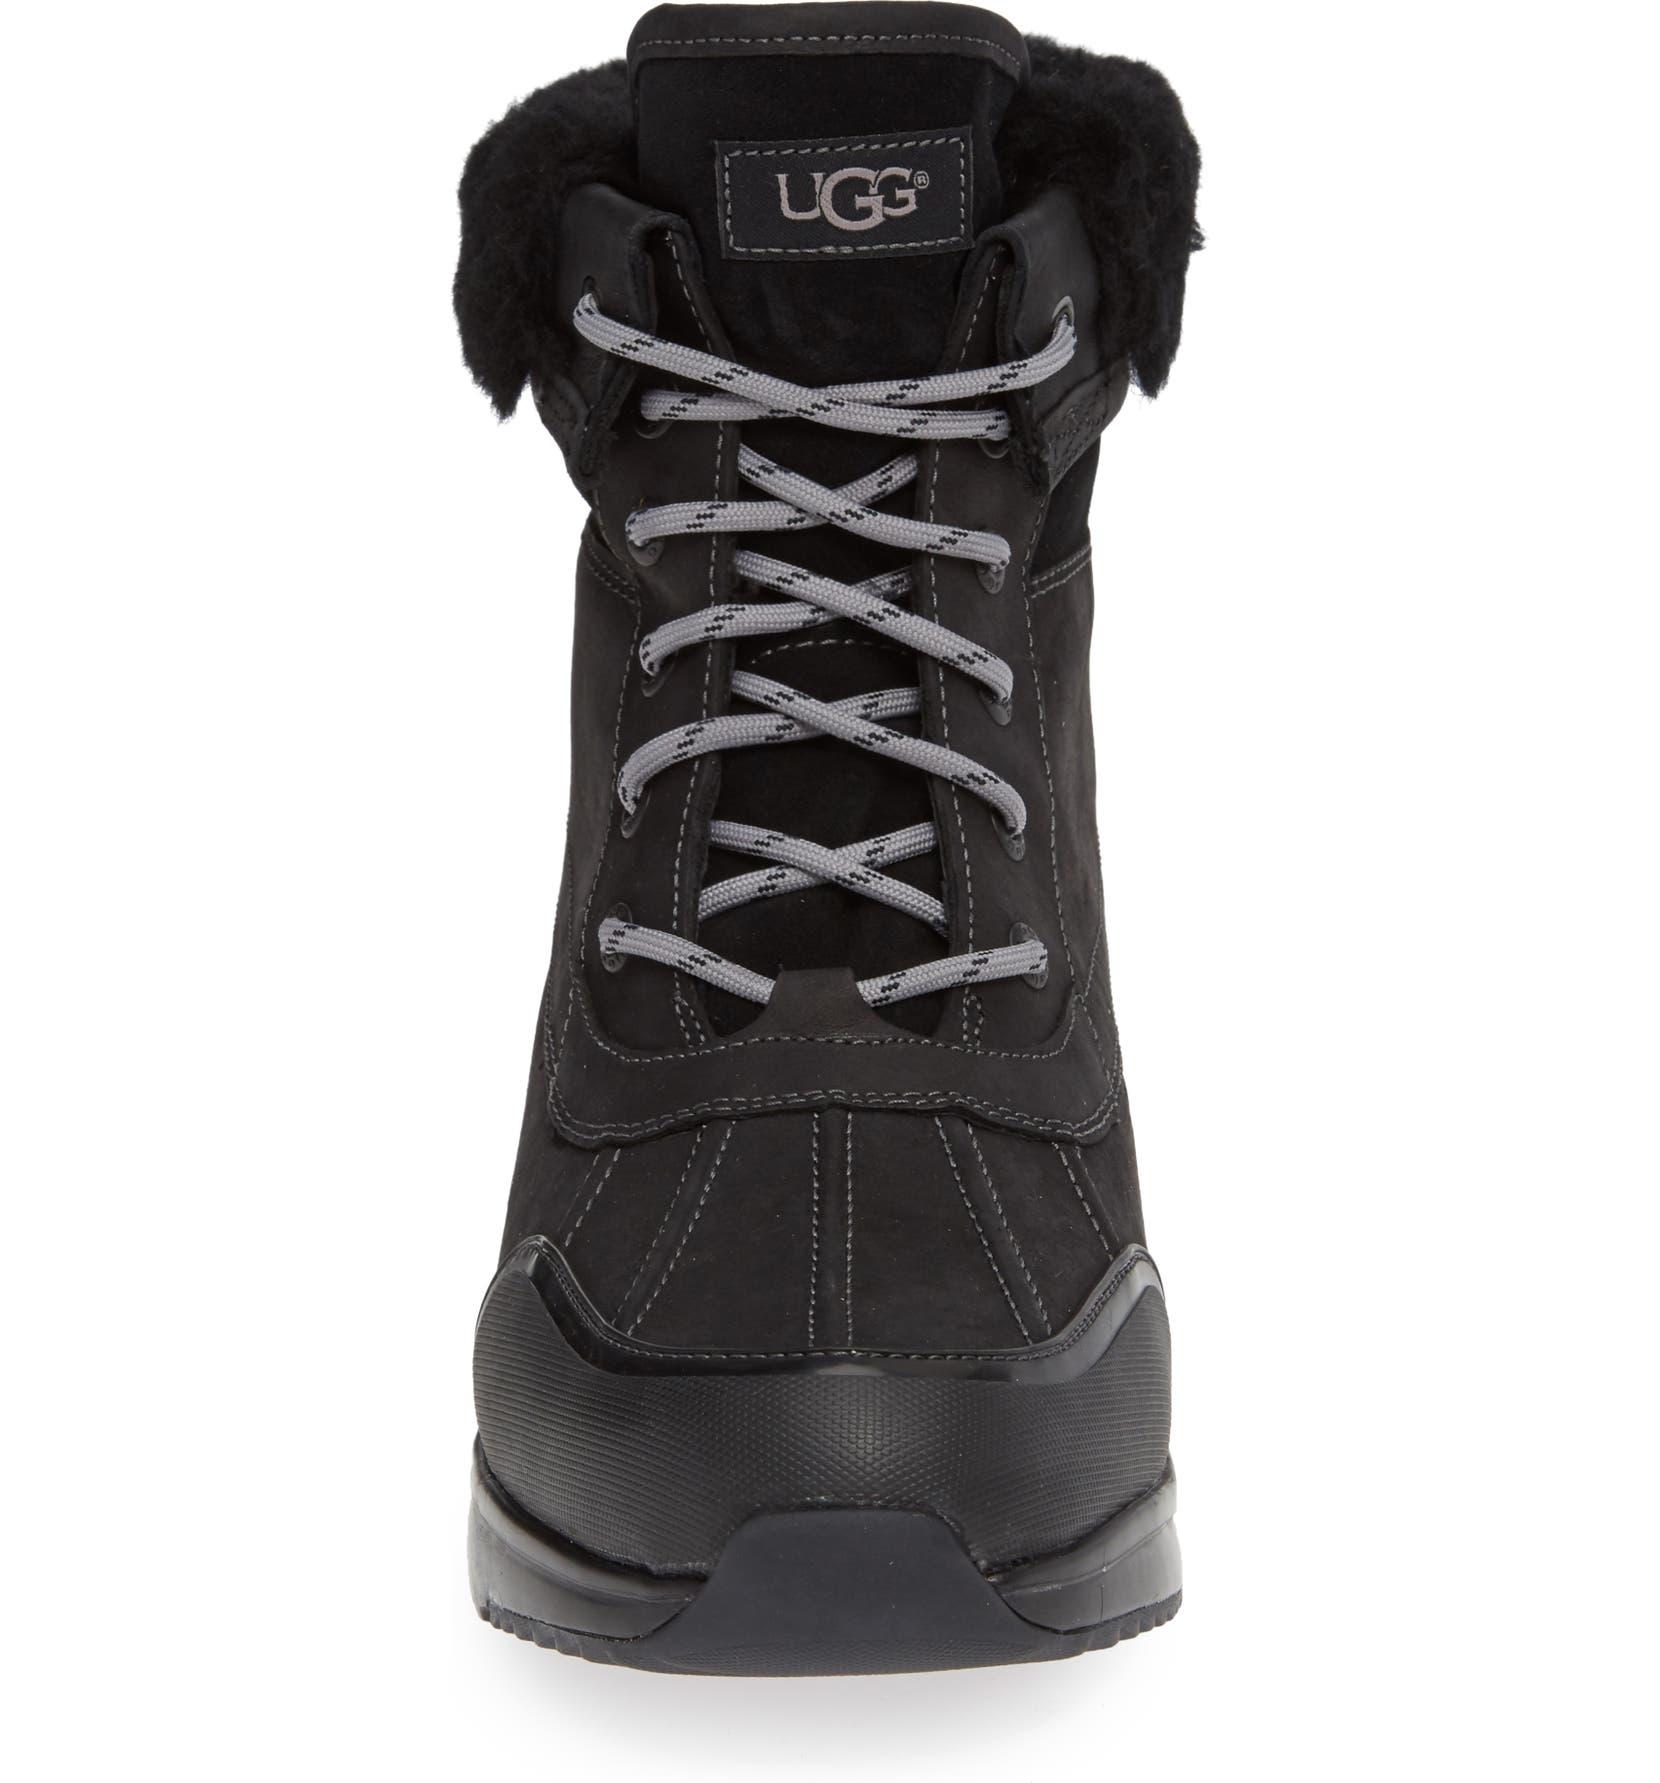 1a9a198d291 Eliasson Waterproof Snow Boot